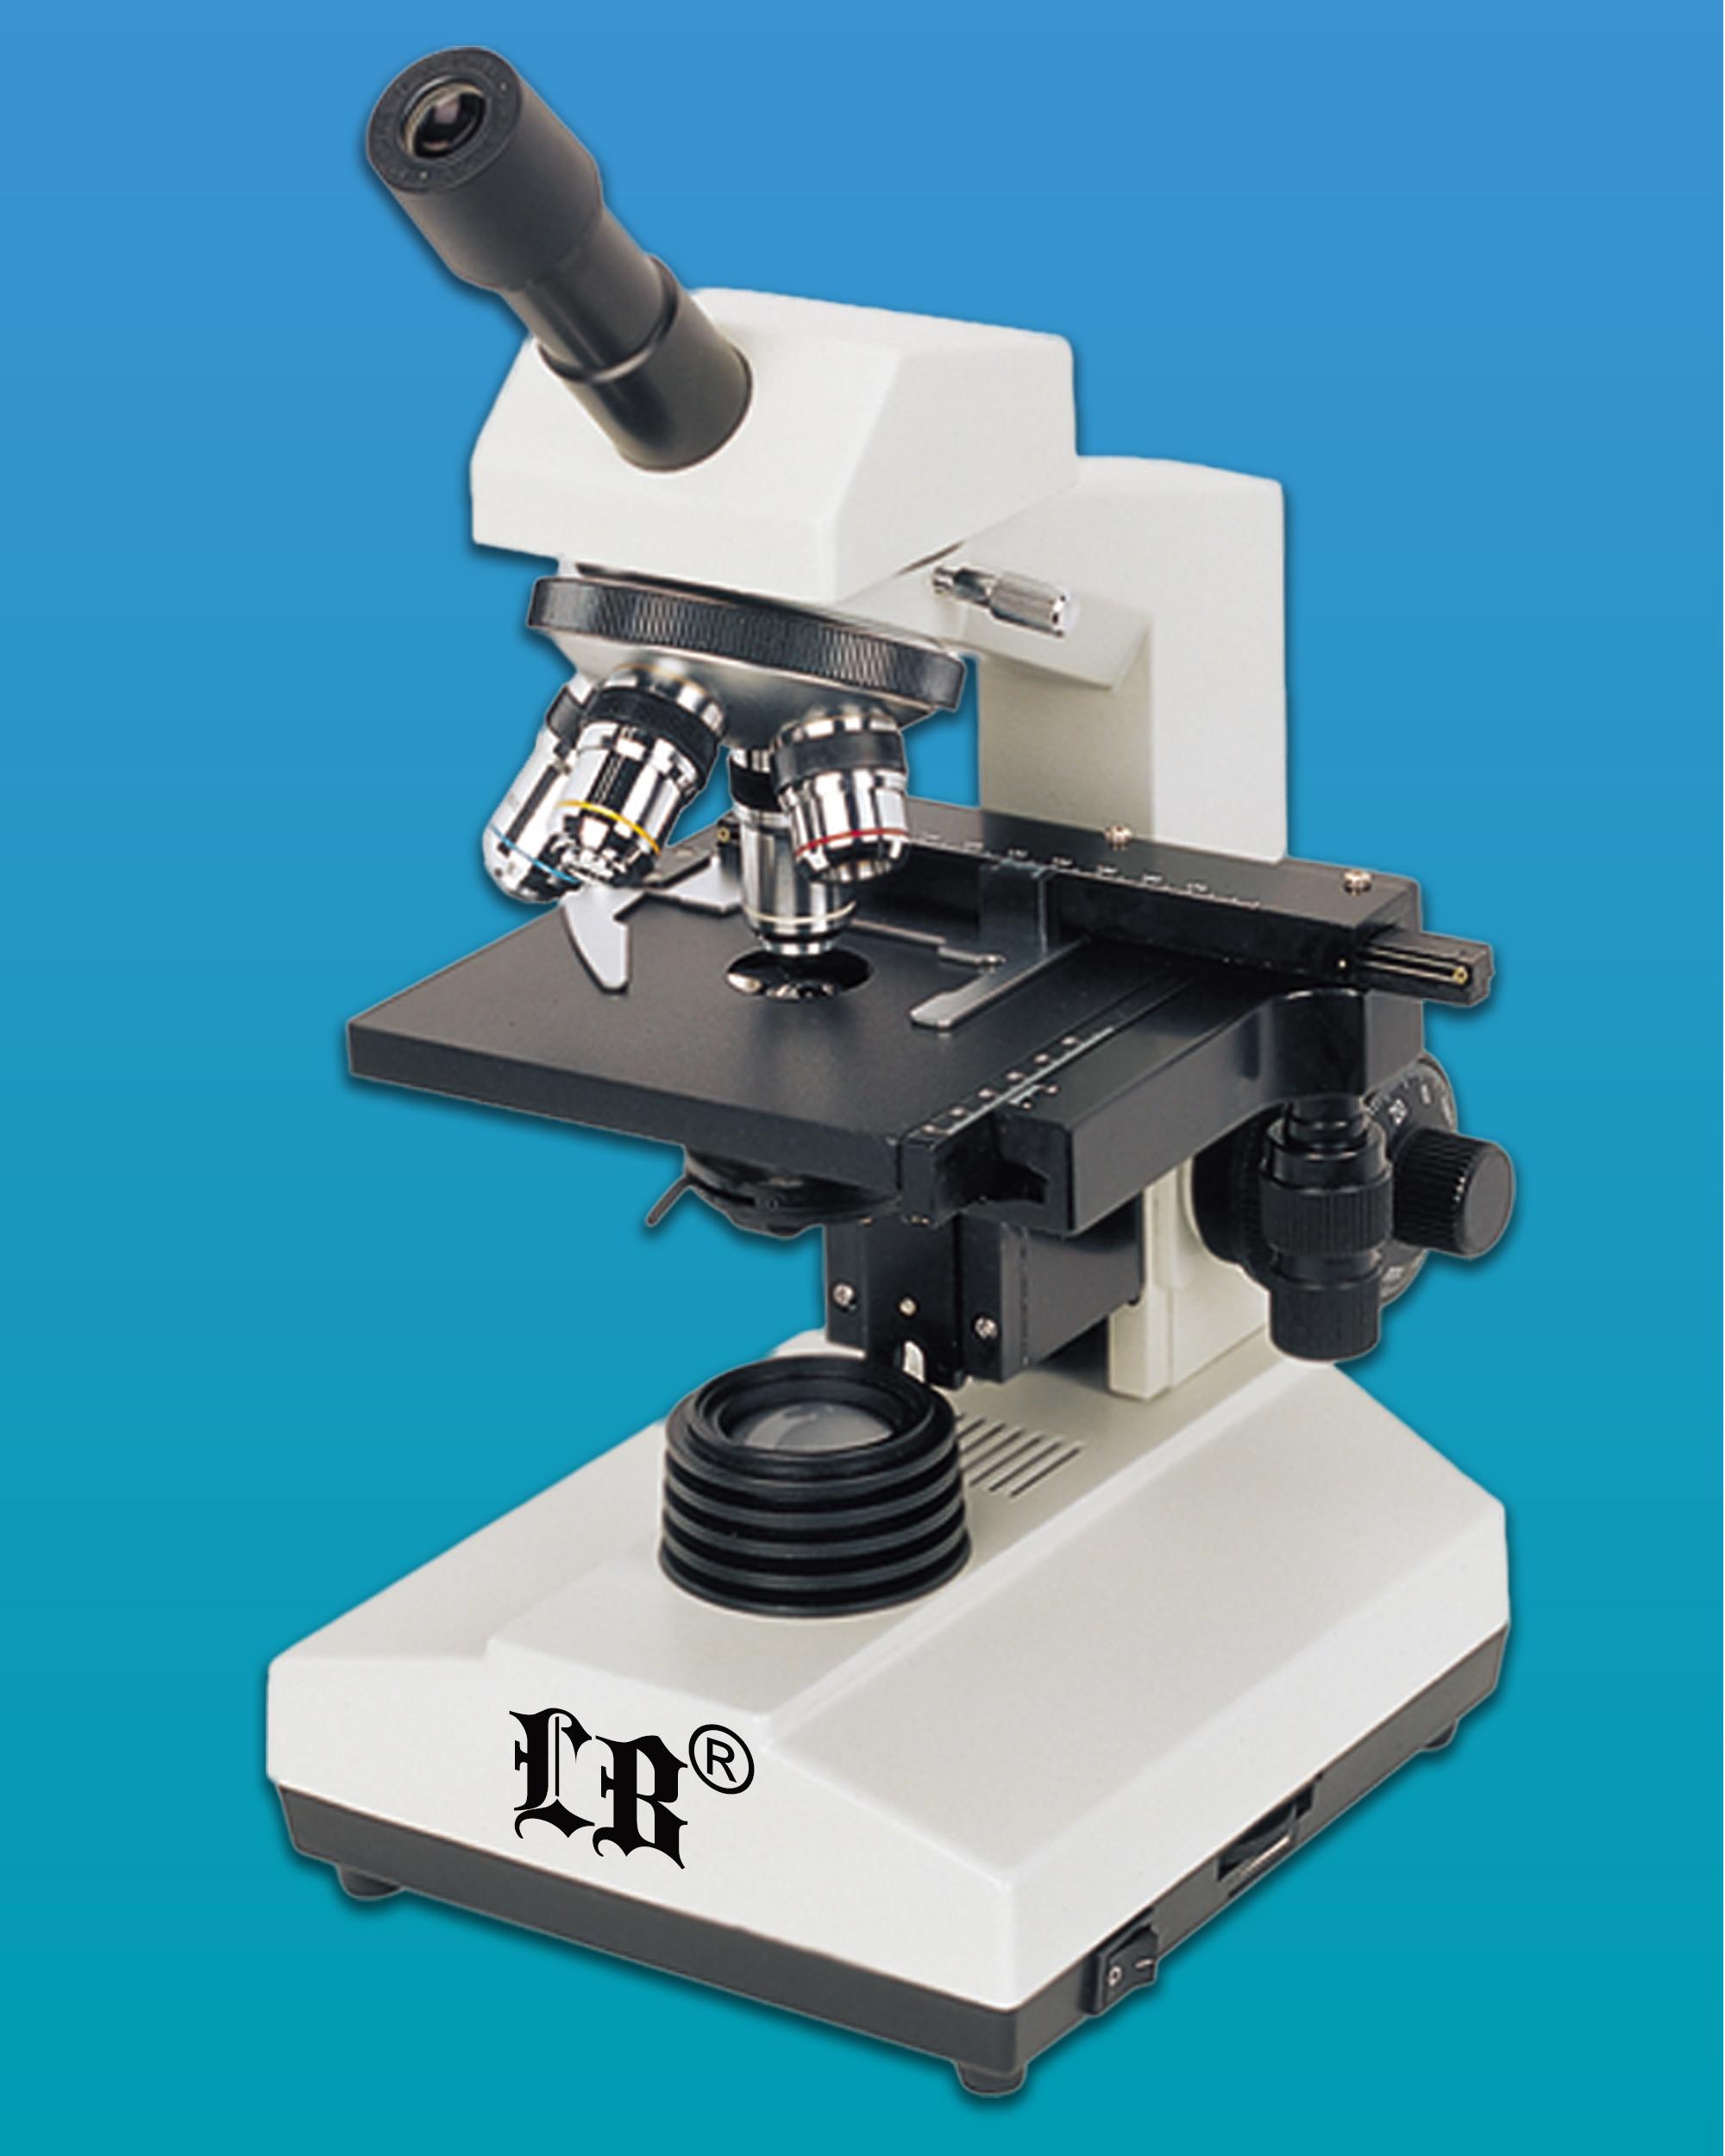 [LB-125] Monocular Biological Microscope